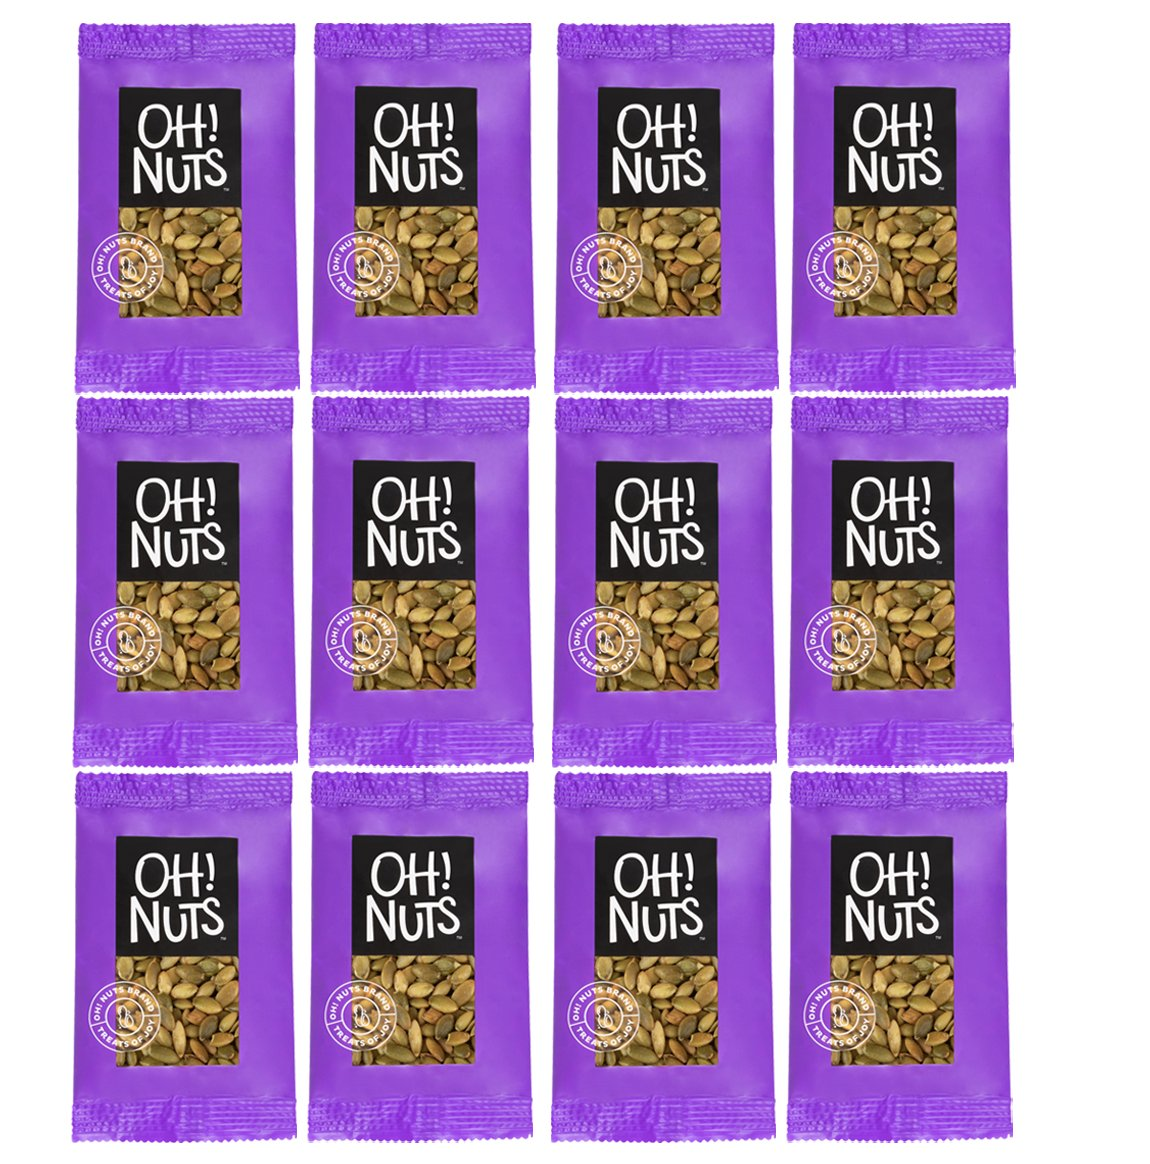 Oh! Nuts Healthy Pumpkin Seeds Roasted Salted | Pepitas Individual Servings Snack | Grab and Go Snacks Pack